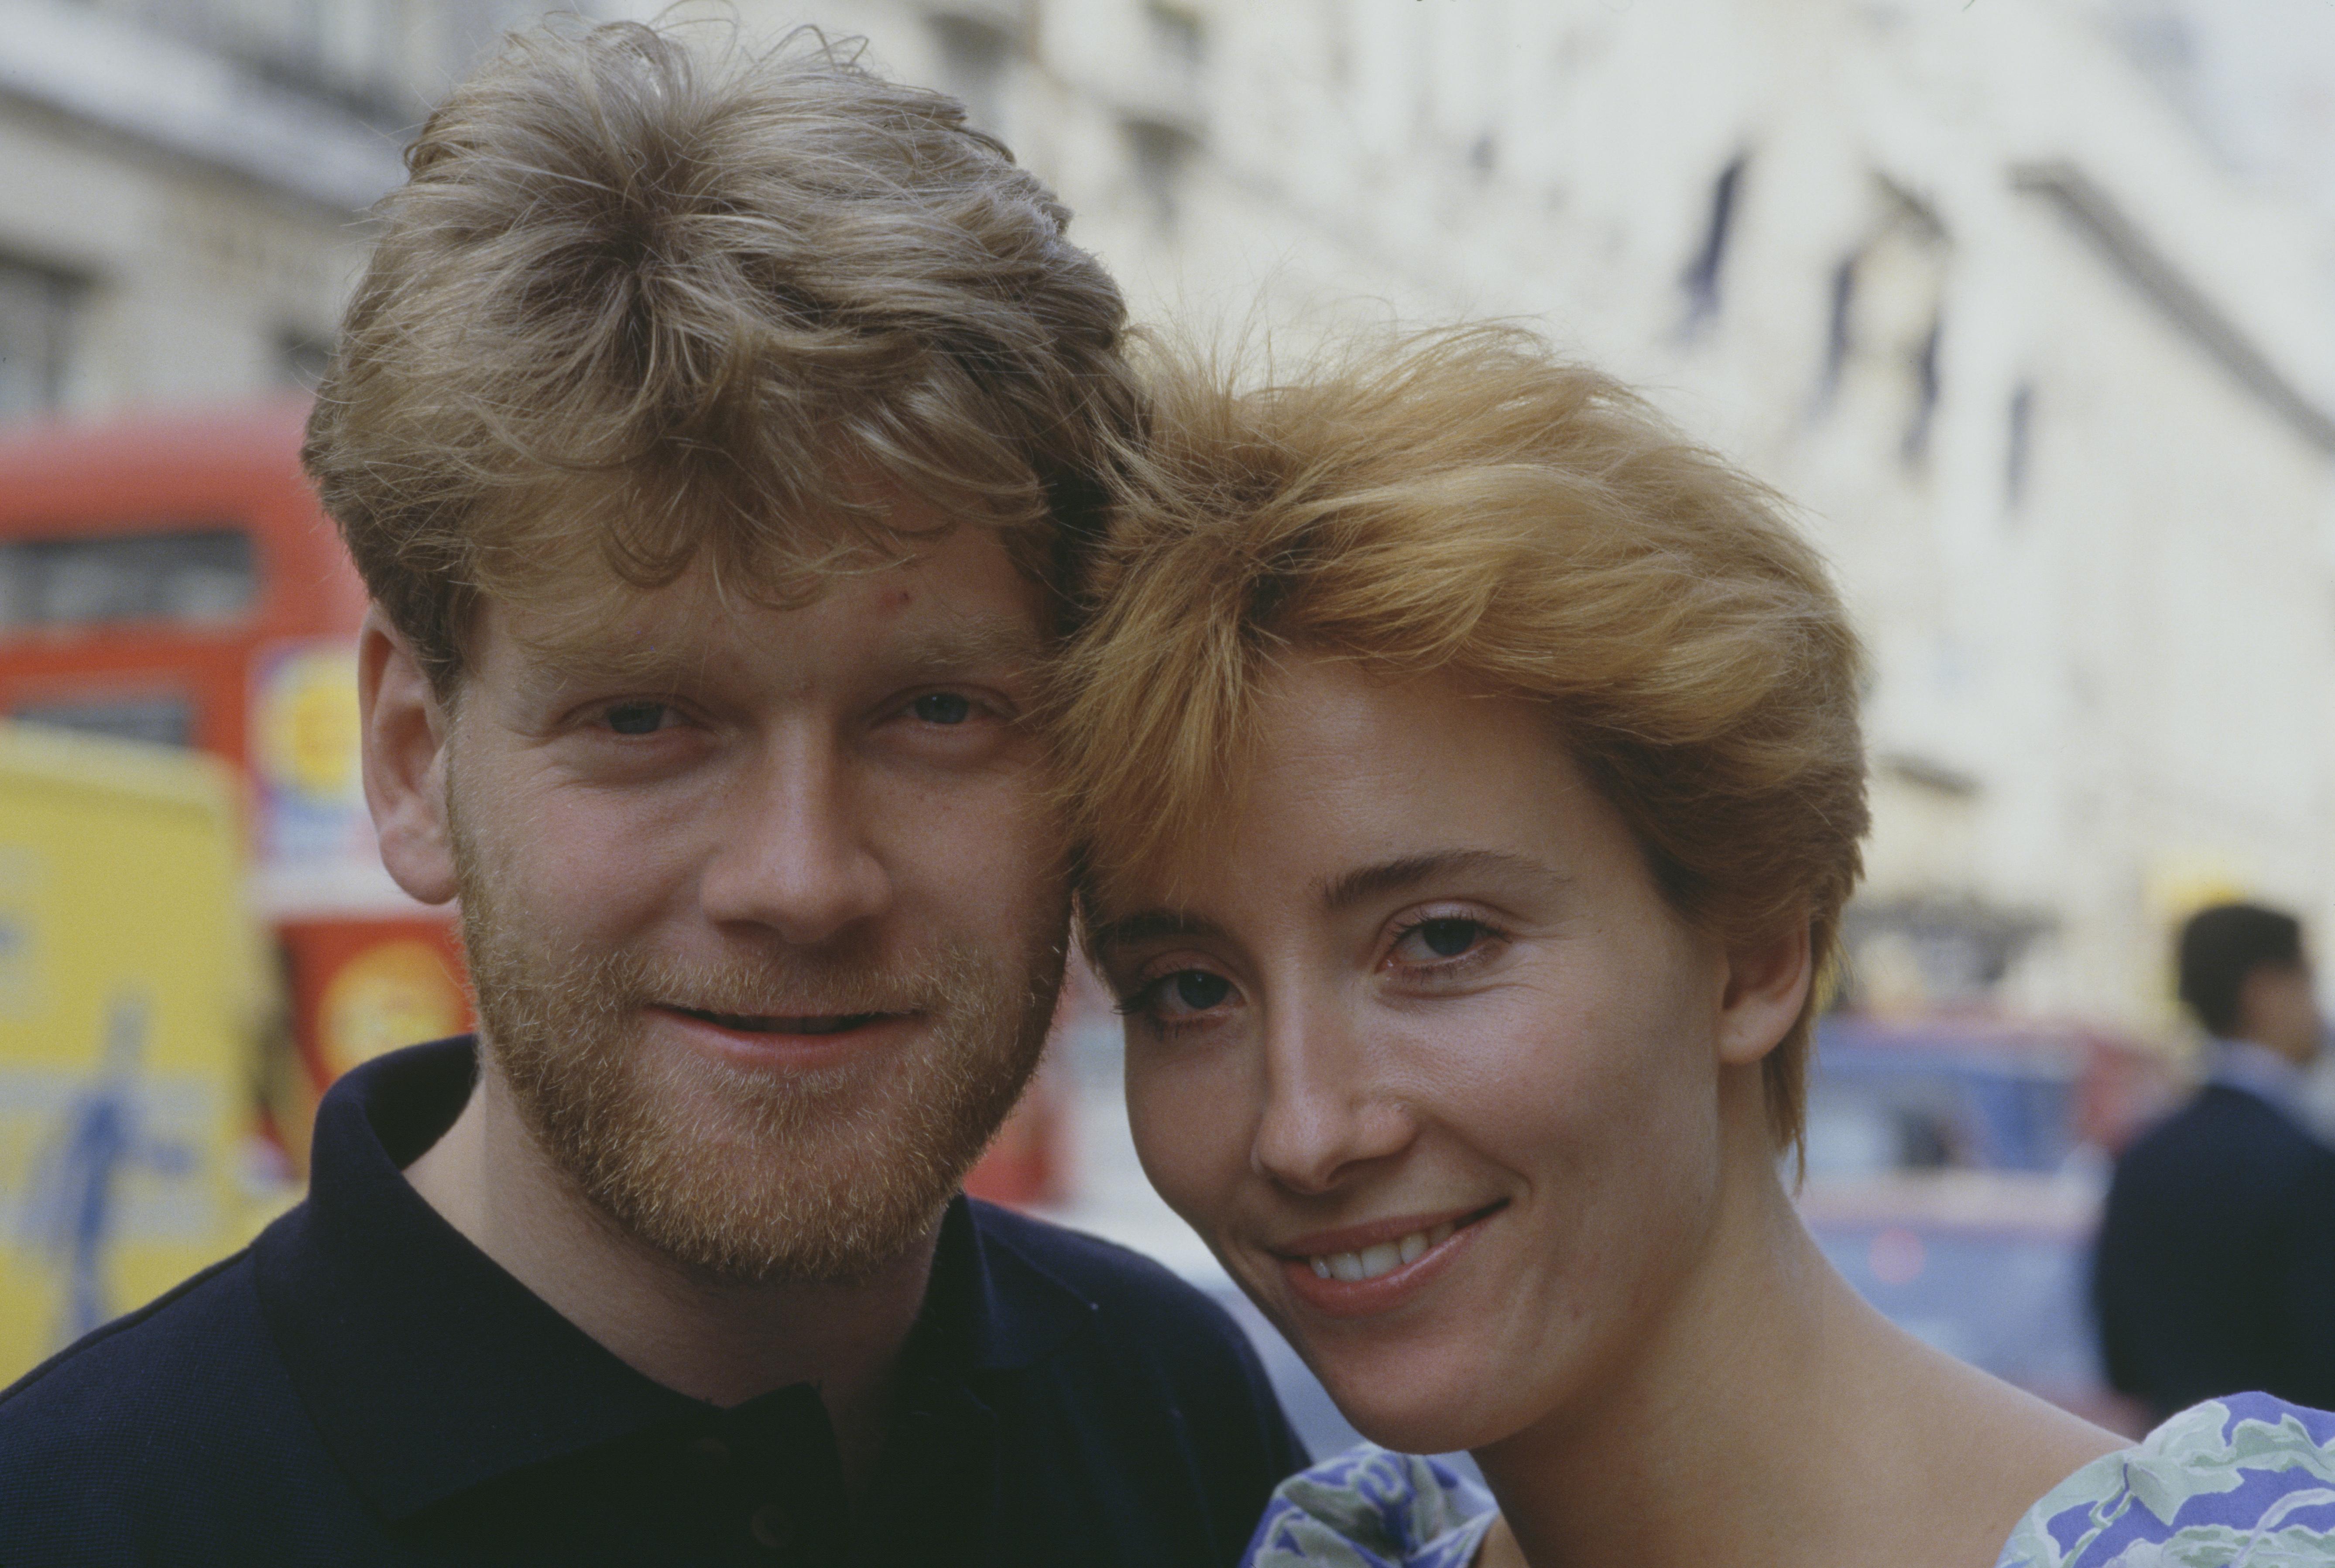 Kenneth Branagh, Emma Thompson, divorce, what happened, explainer